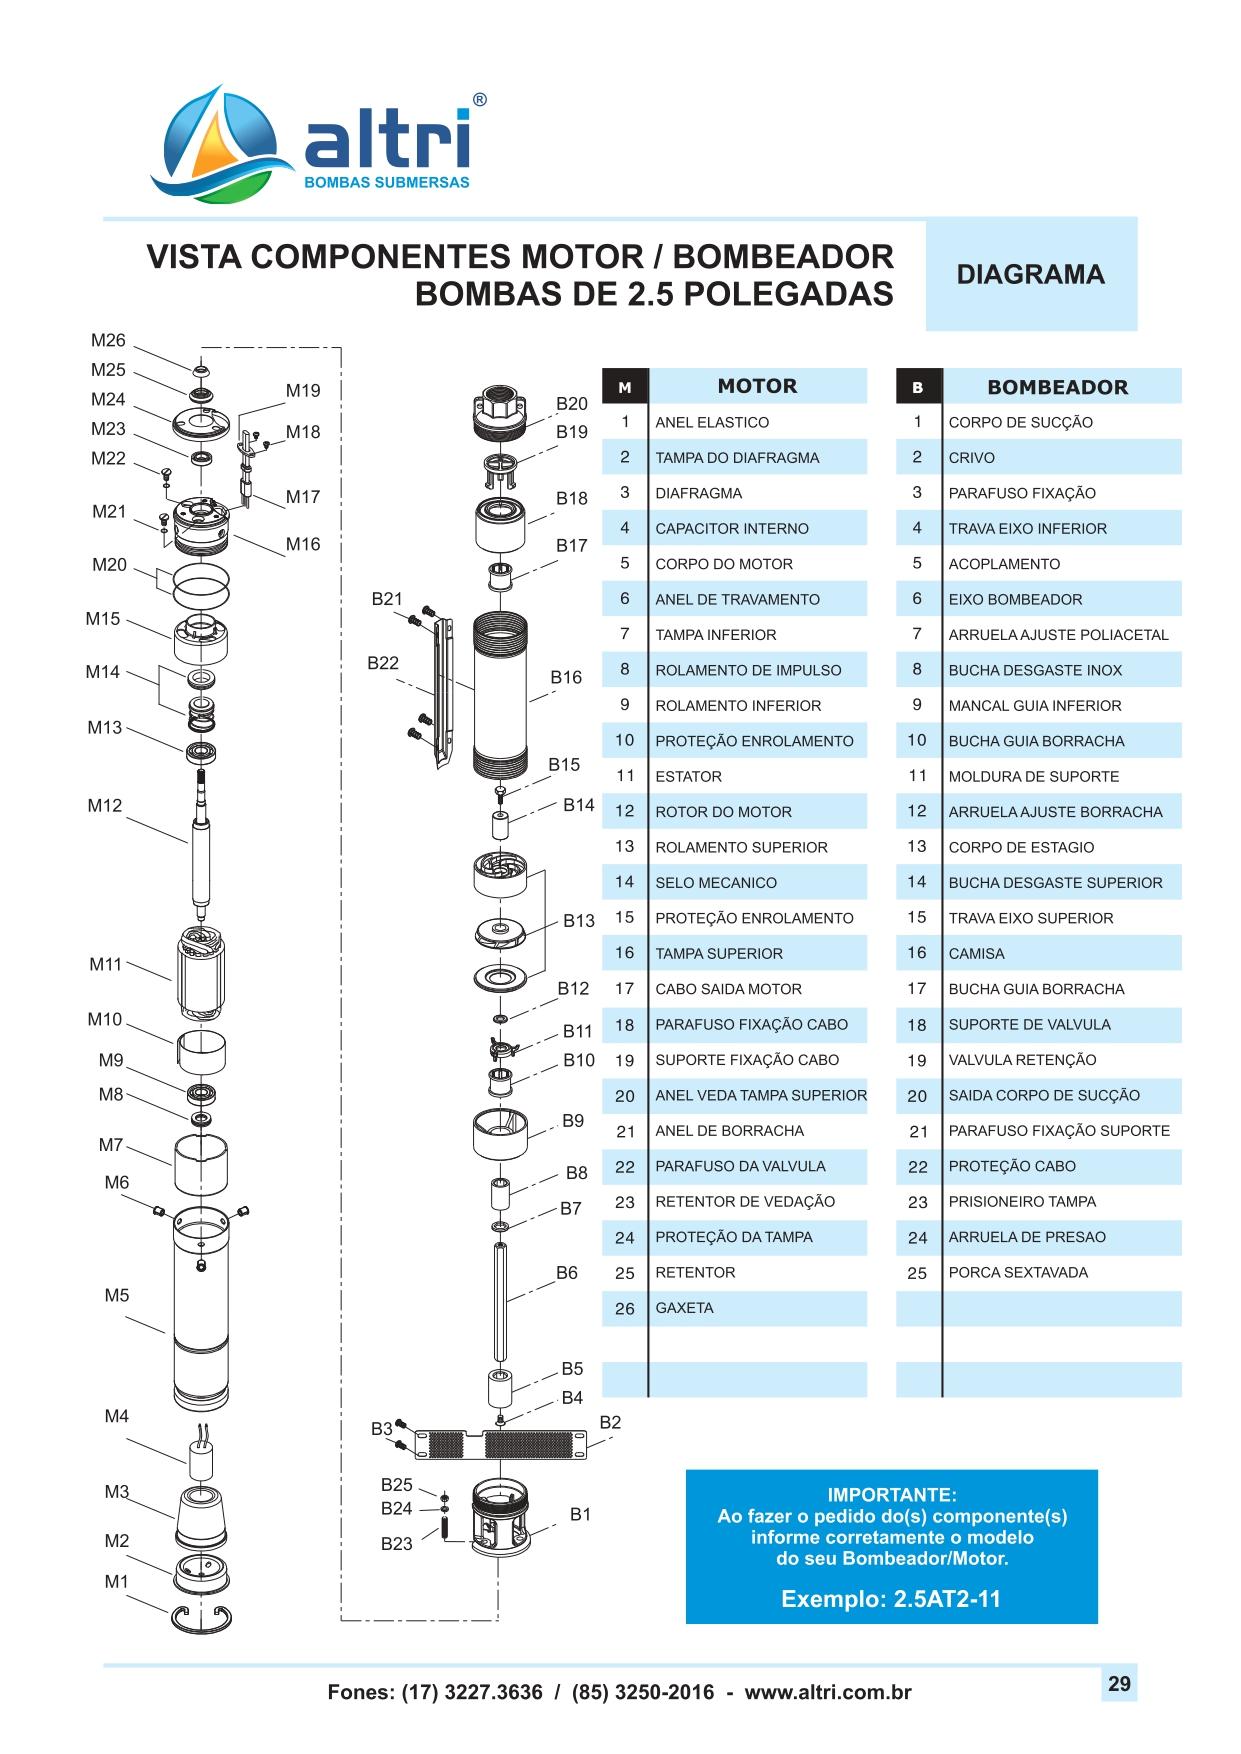 CATALOGO DE PRODUTOS ALTRI 2021 - WEB_page-0031